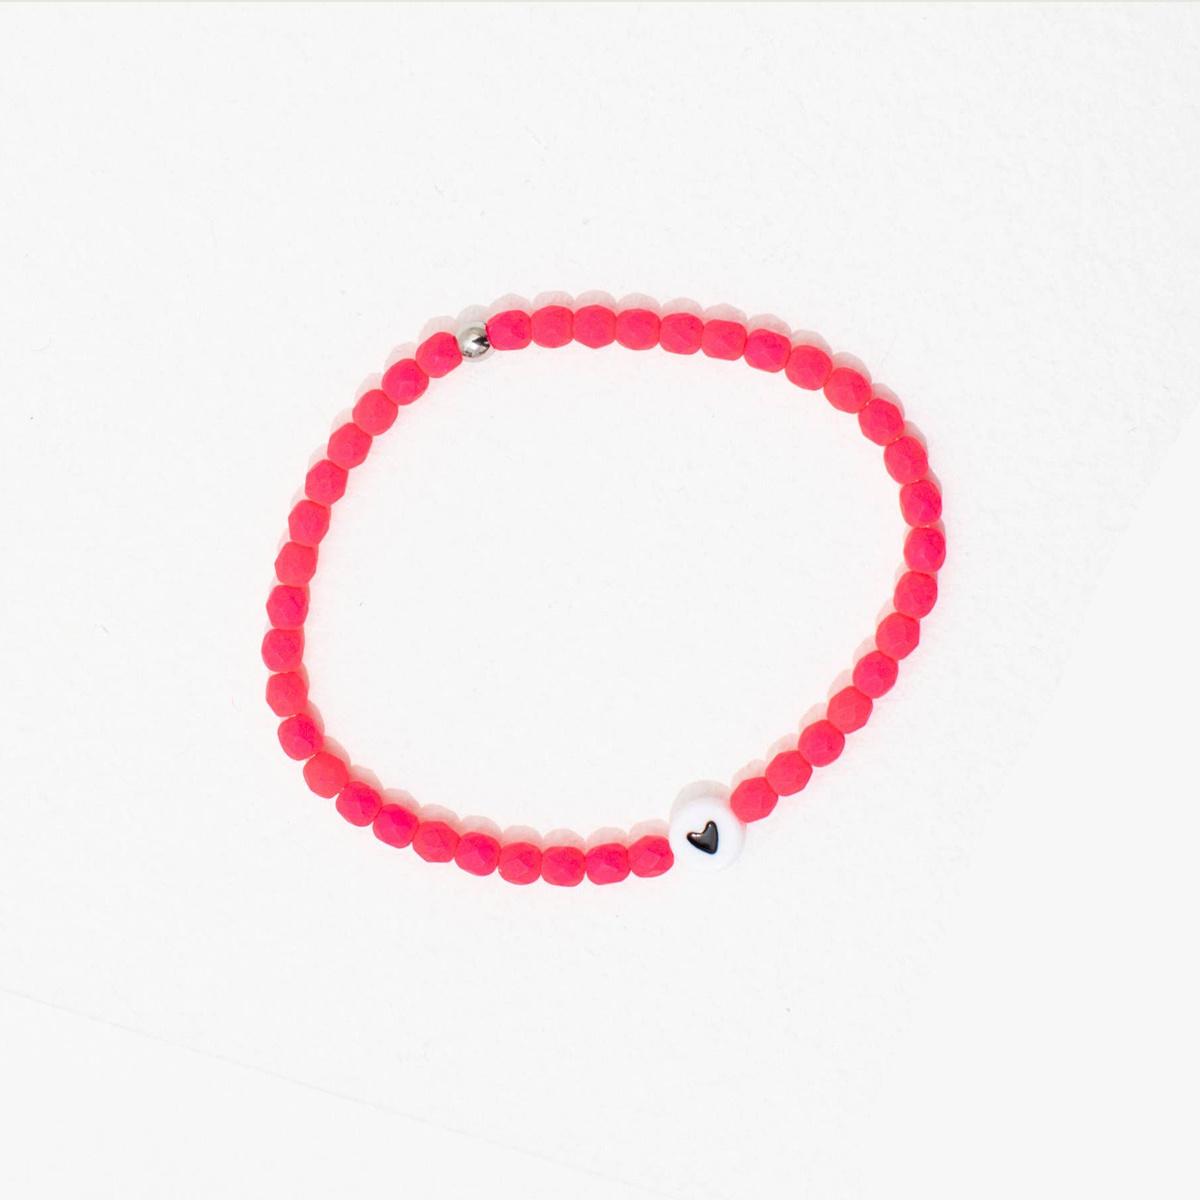 Larissa Loden Jewelry - LLJ Kids Heart Bracelet Craft Kit